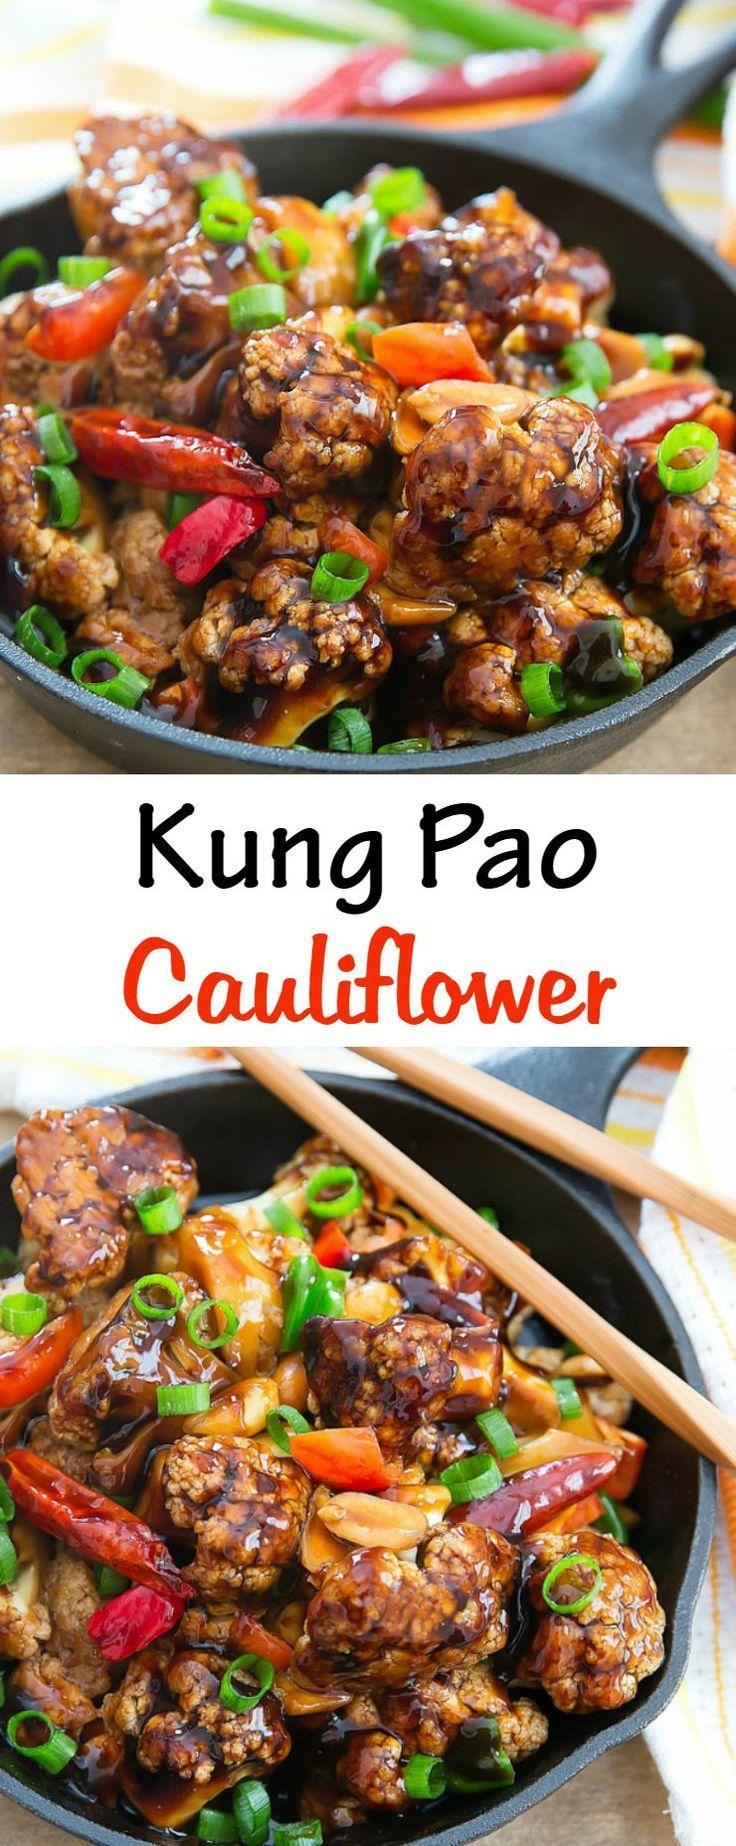 Kung Pao Cauliflower. A healthier version of Kung Pao Chicken!